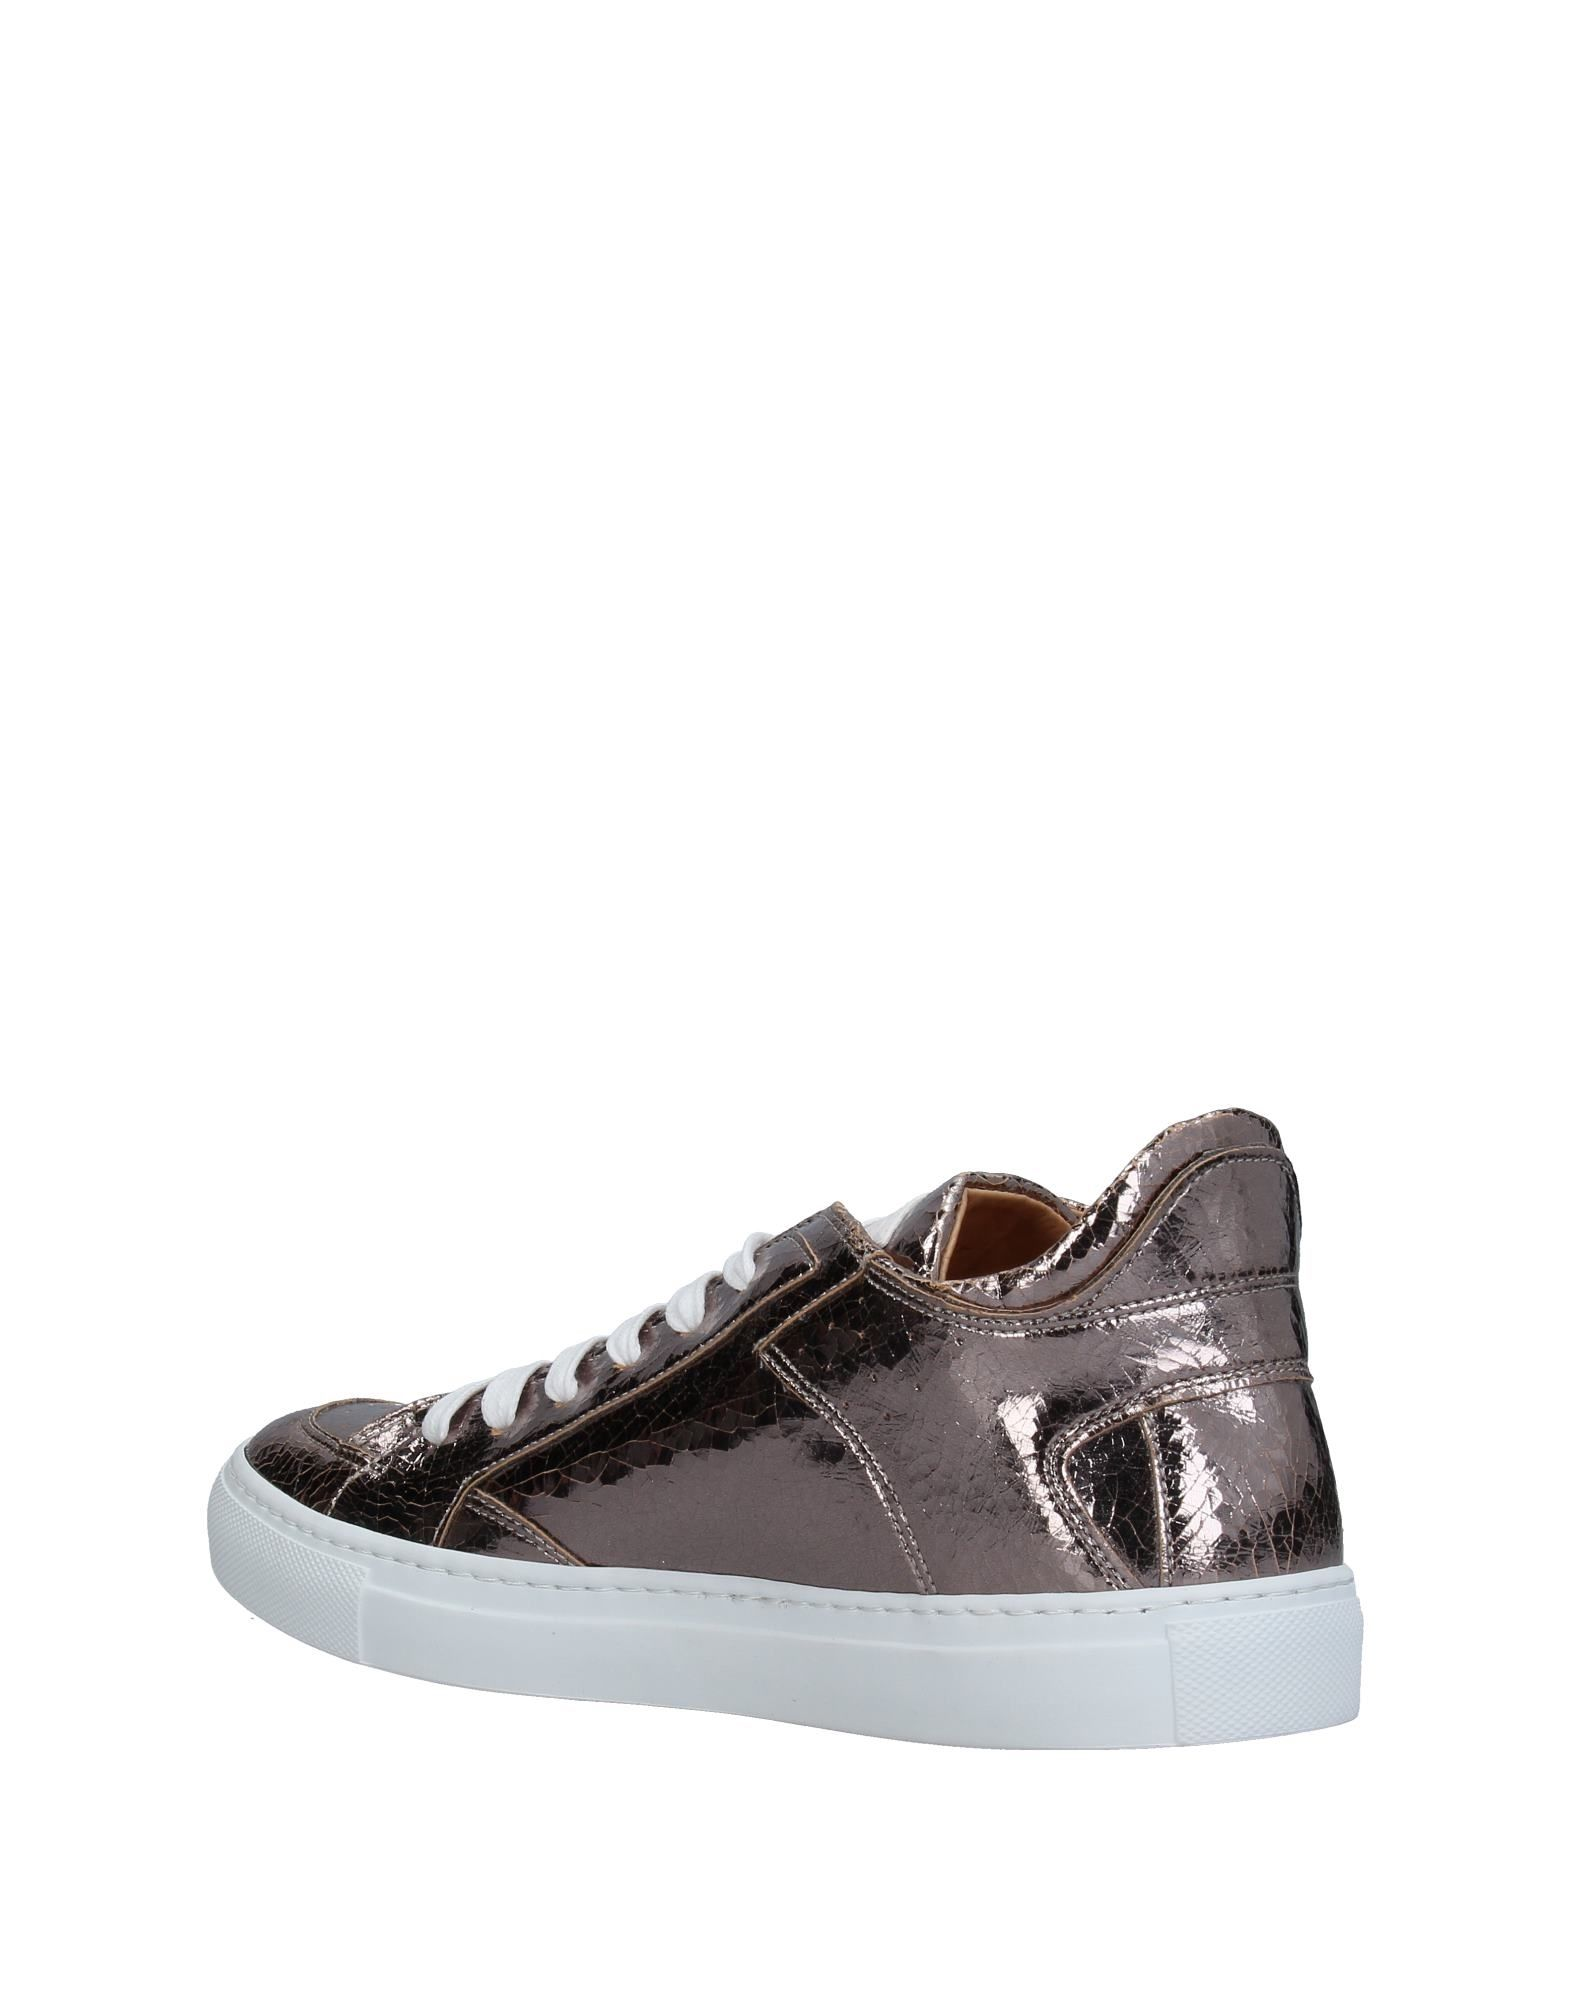 Mm6 Maison Margiela Sneakers - Women Mm6 Maison Margiela Sneakers Sneakers Sneakers online on  United Kingdom - 11334505FV 933c1e